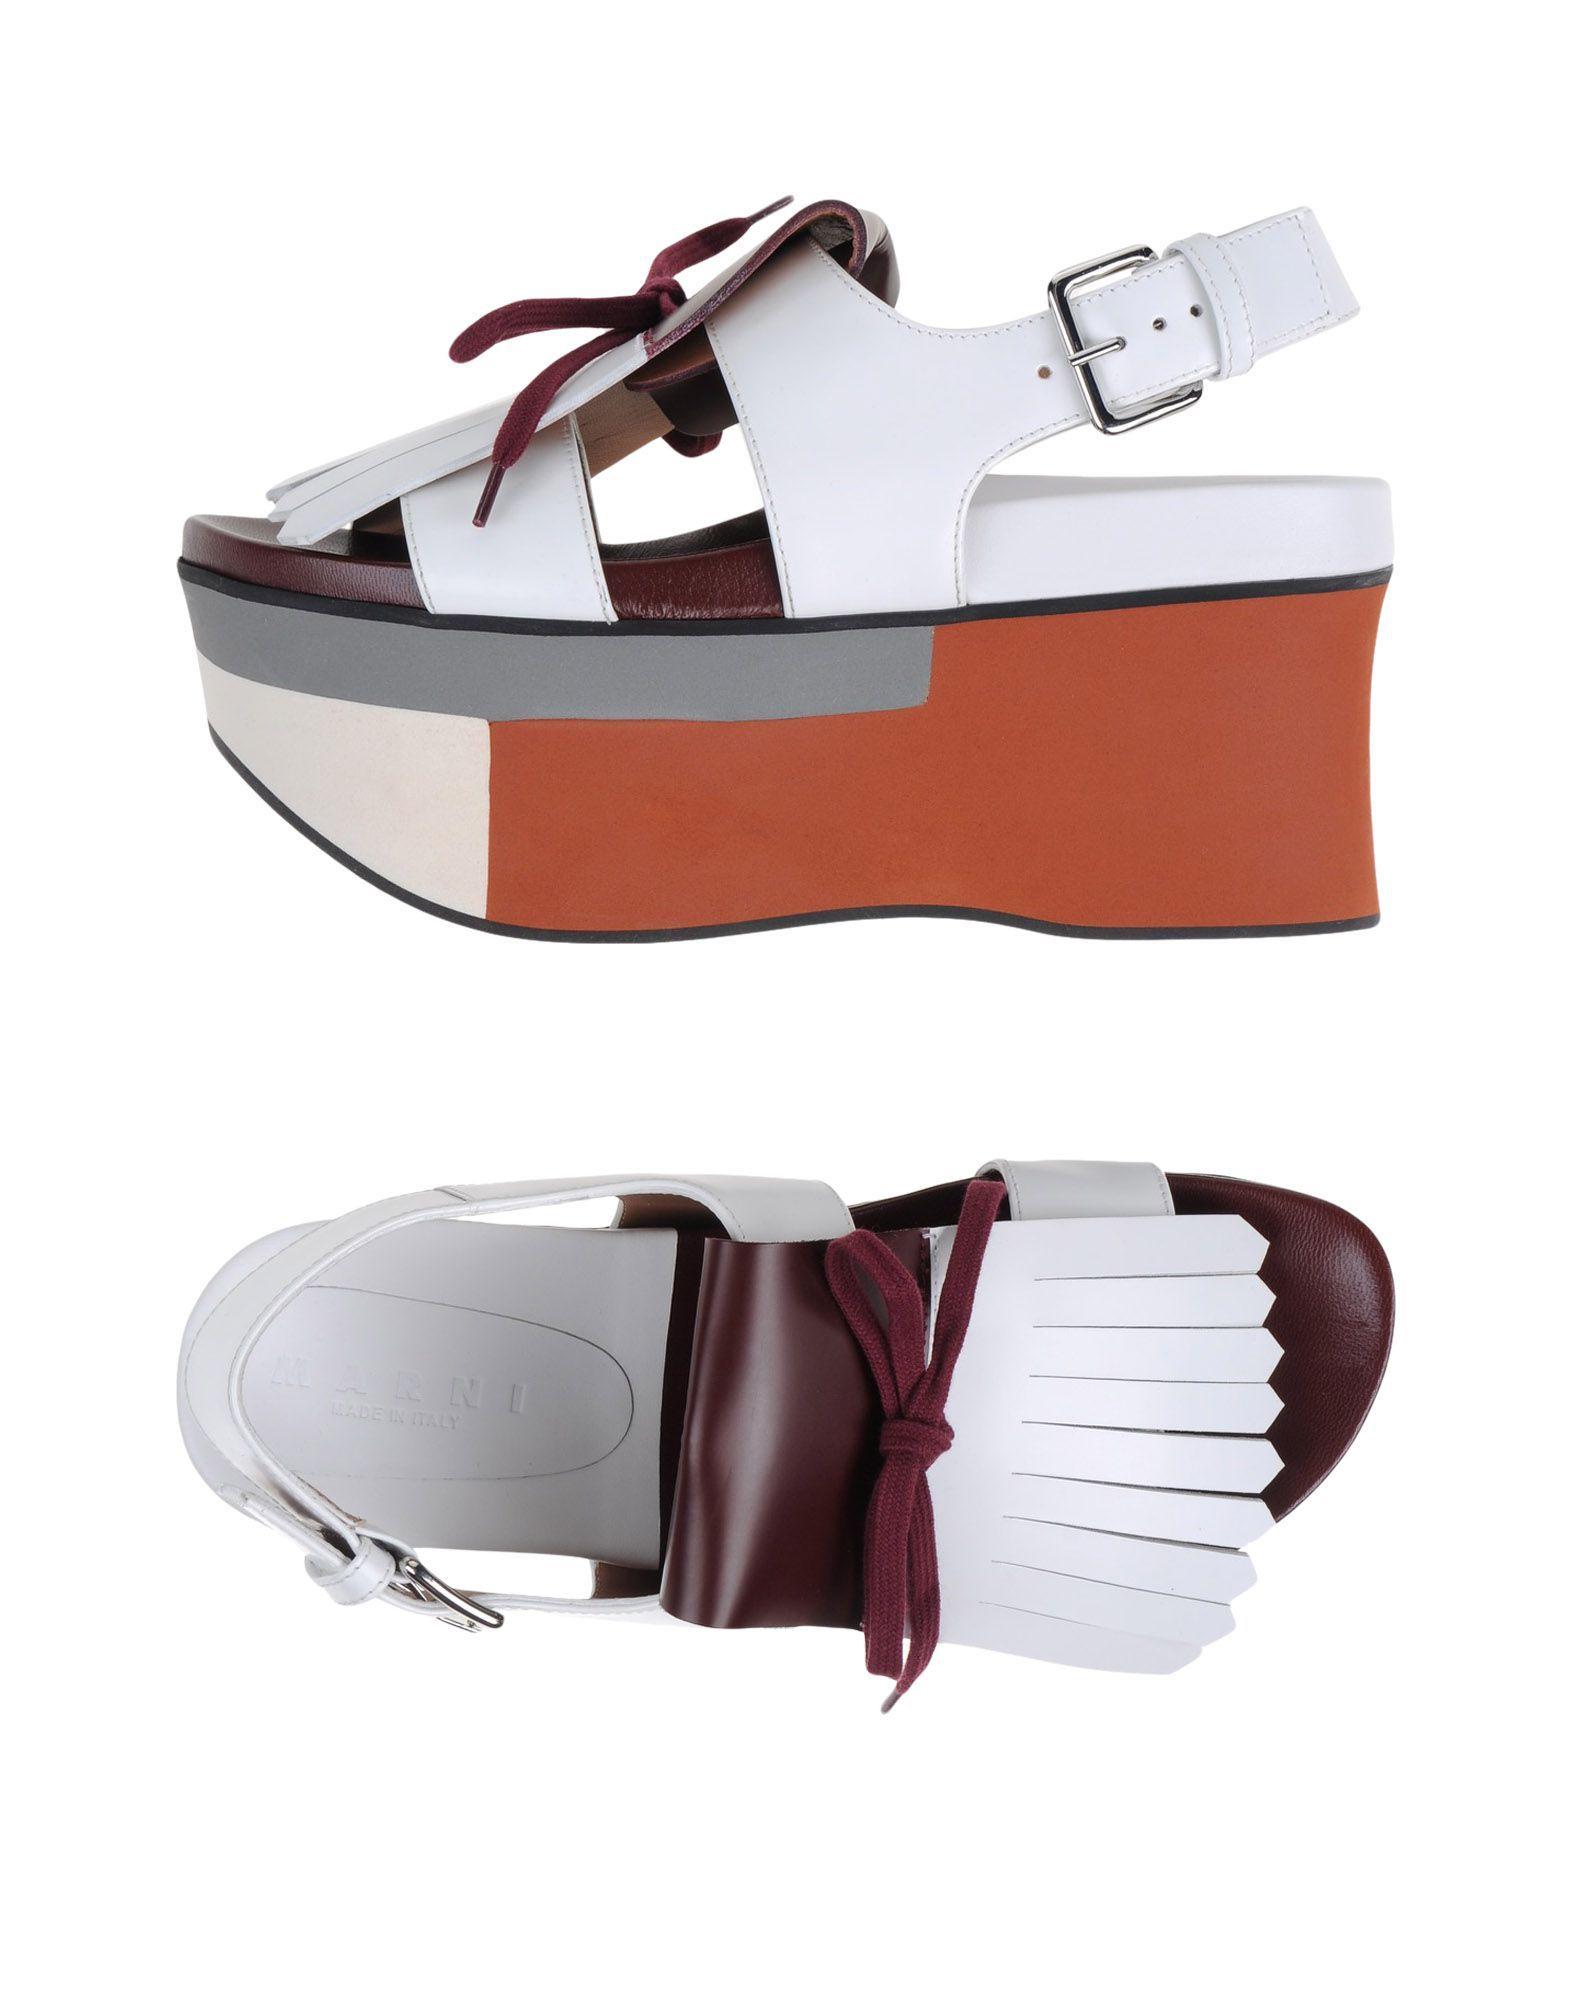 eb977036c81 Marni Sandals - Women Marni Sandals online on YOOX United States -  44972988NF